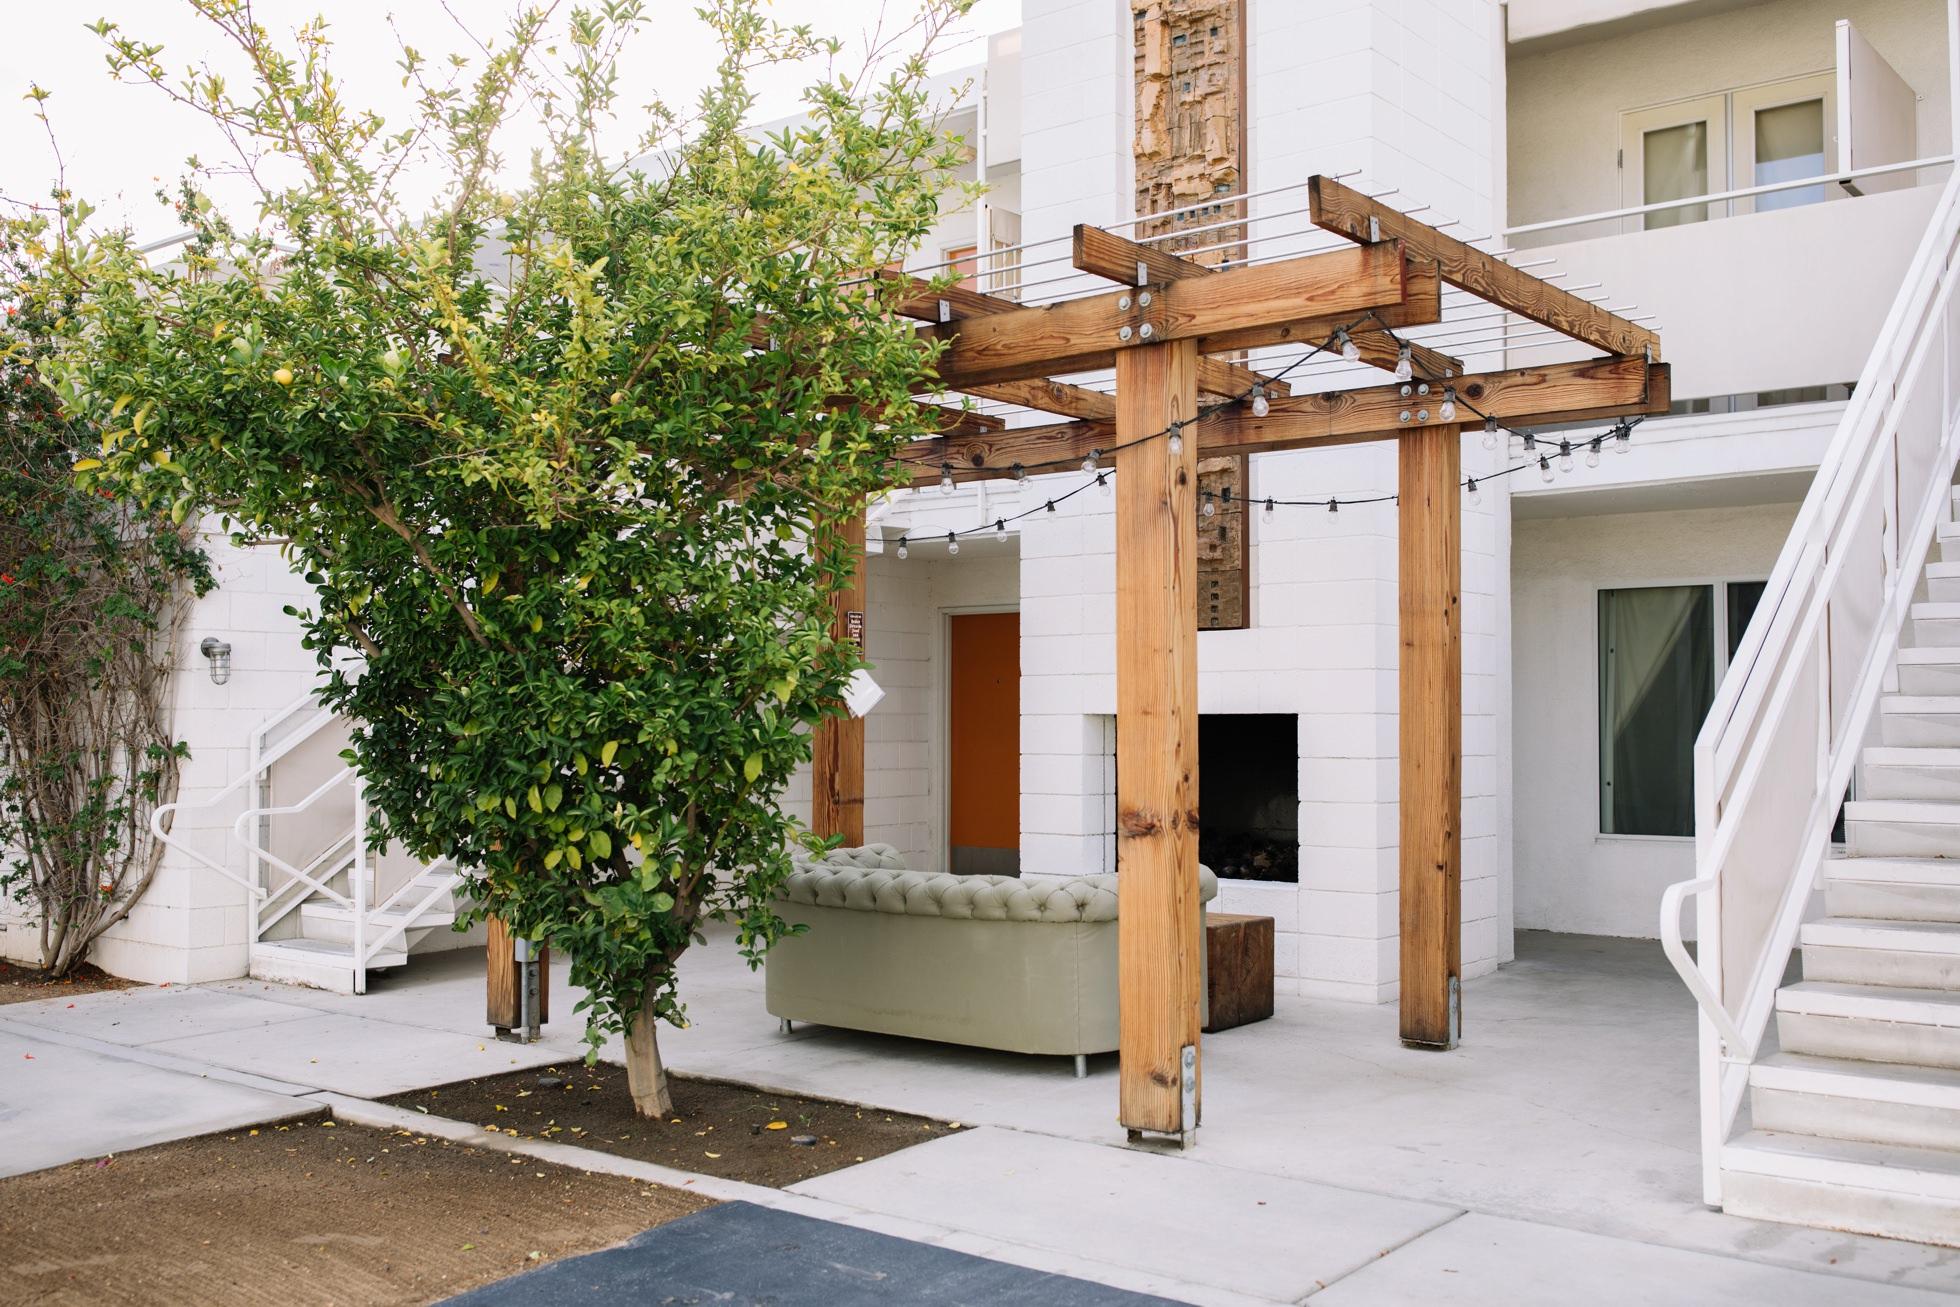 0068-ace-hotel-palm-springs-ca-modern-desert-wedding-location